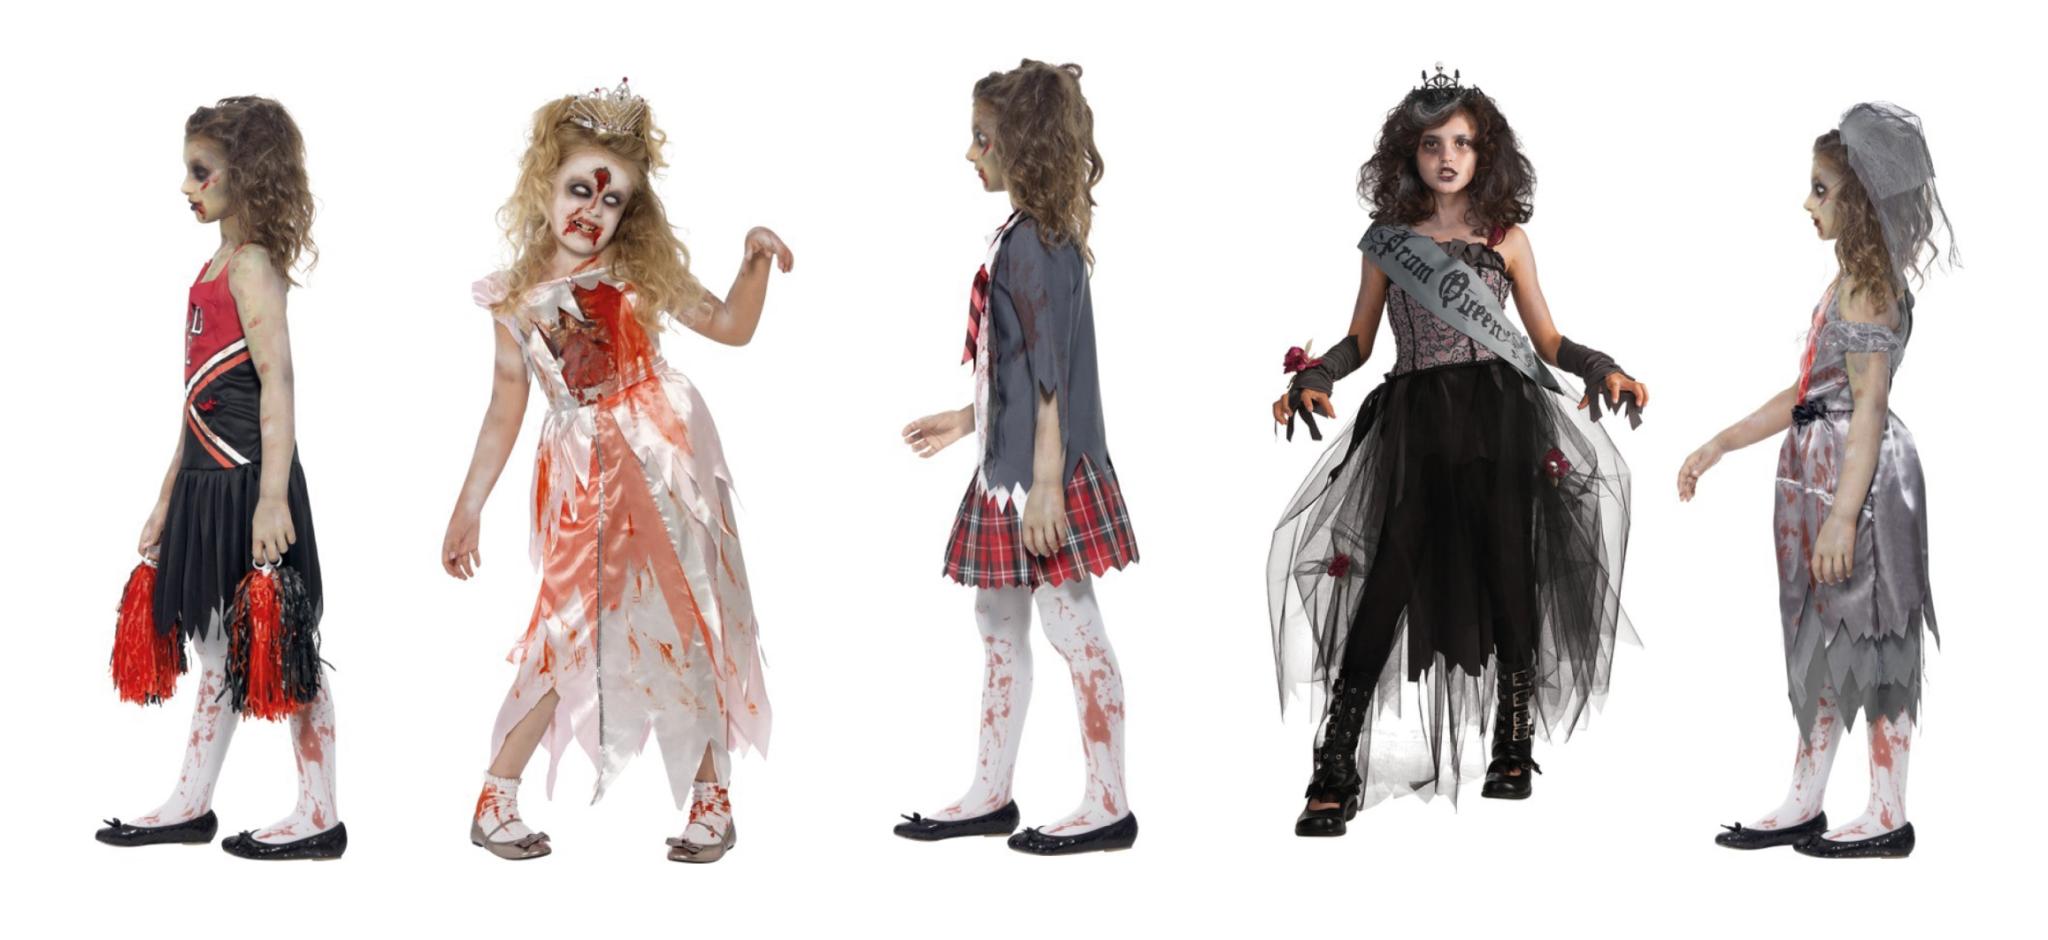 Zombie kostume, zombie kostumer til piger, børne zombie kostumer, kostumer til børn, halloween kostumer til børn, zombie prinsesse, prinsesse zombie, skolepige zombie, cheerleader zombie